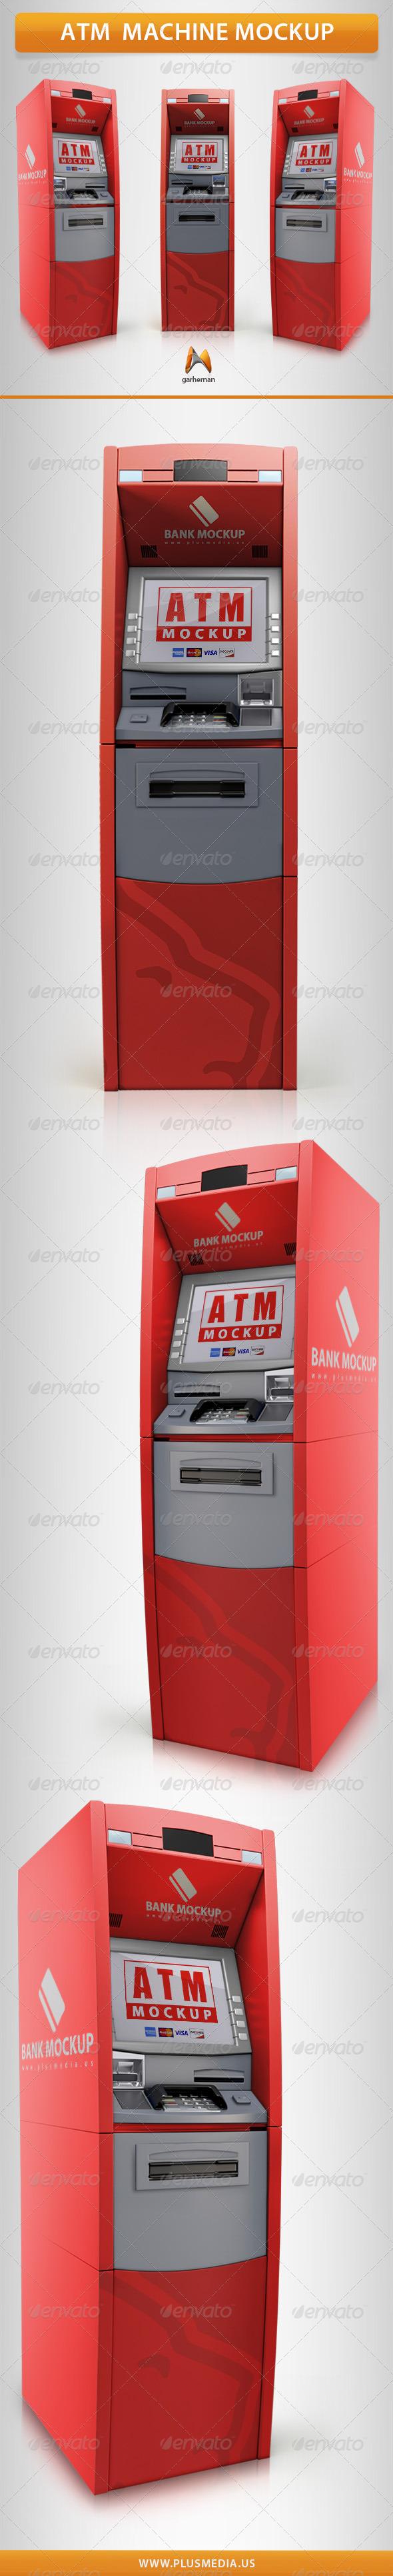 GraphicRiver ATM Machine Mockup 7060848